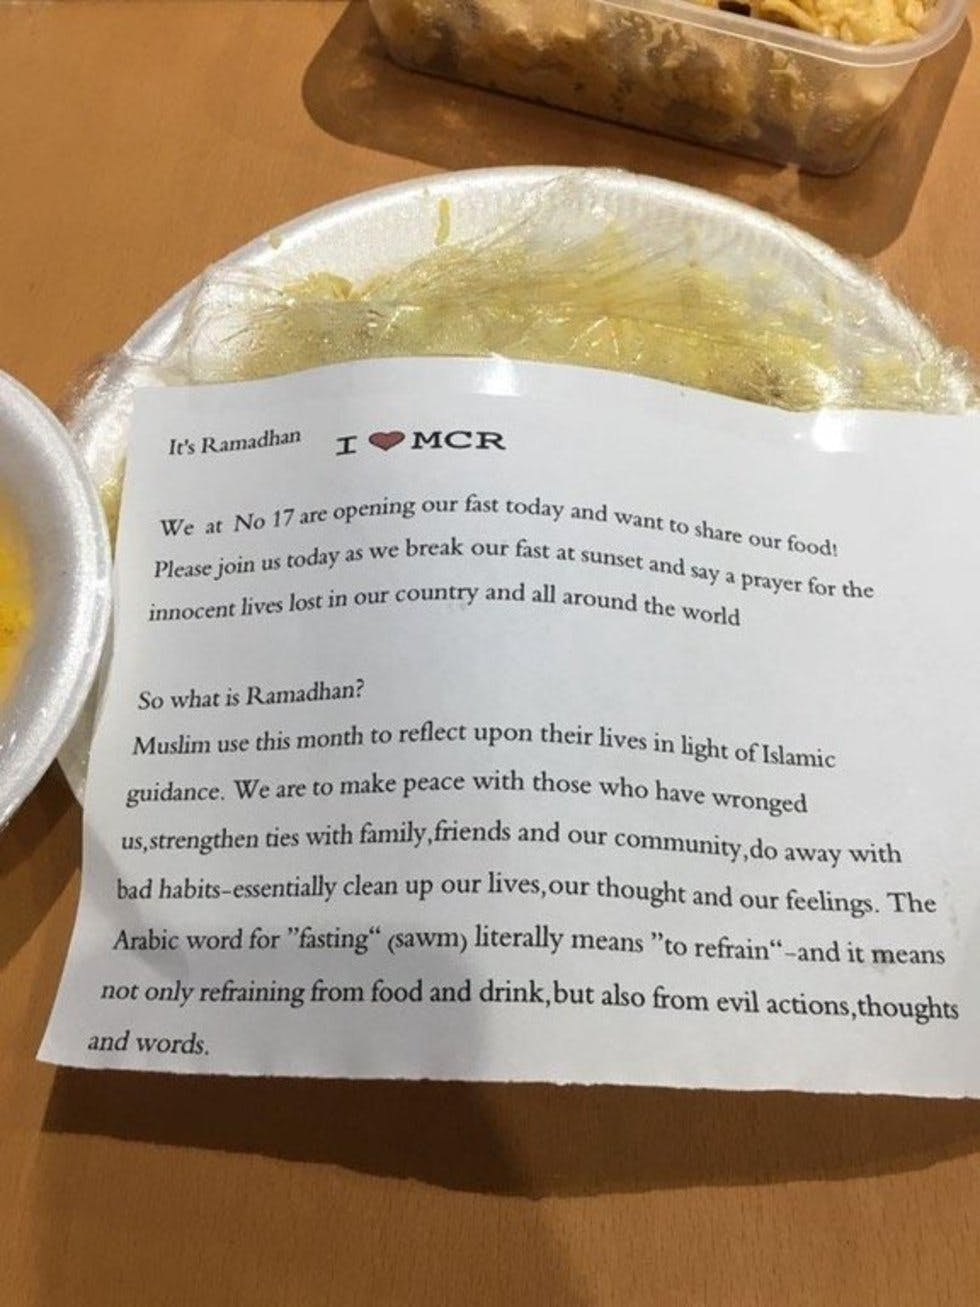 This Mancunian got the best Ramadan gift from their Muslim